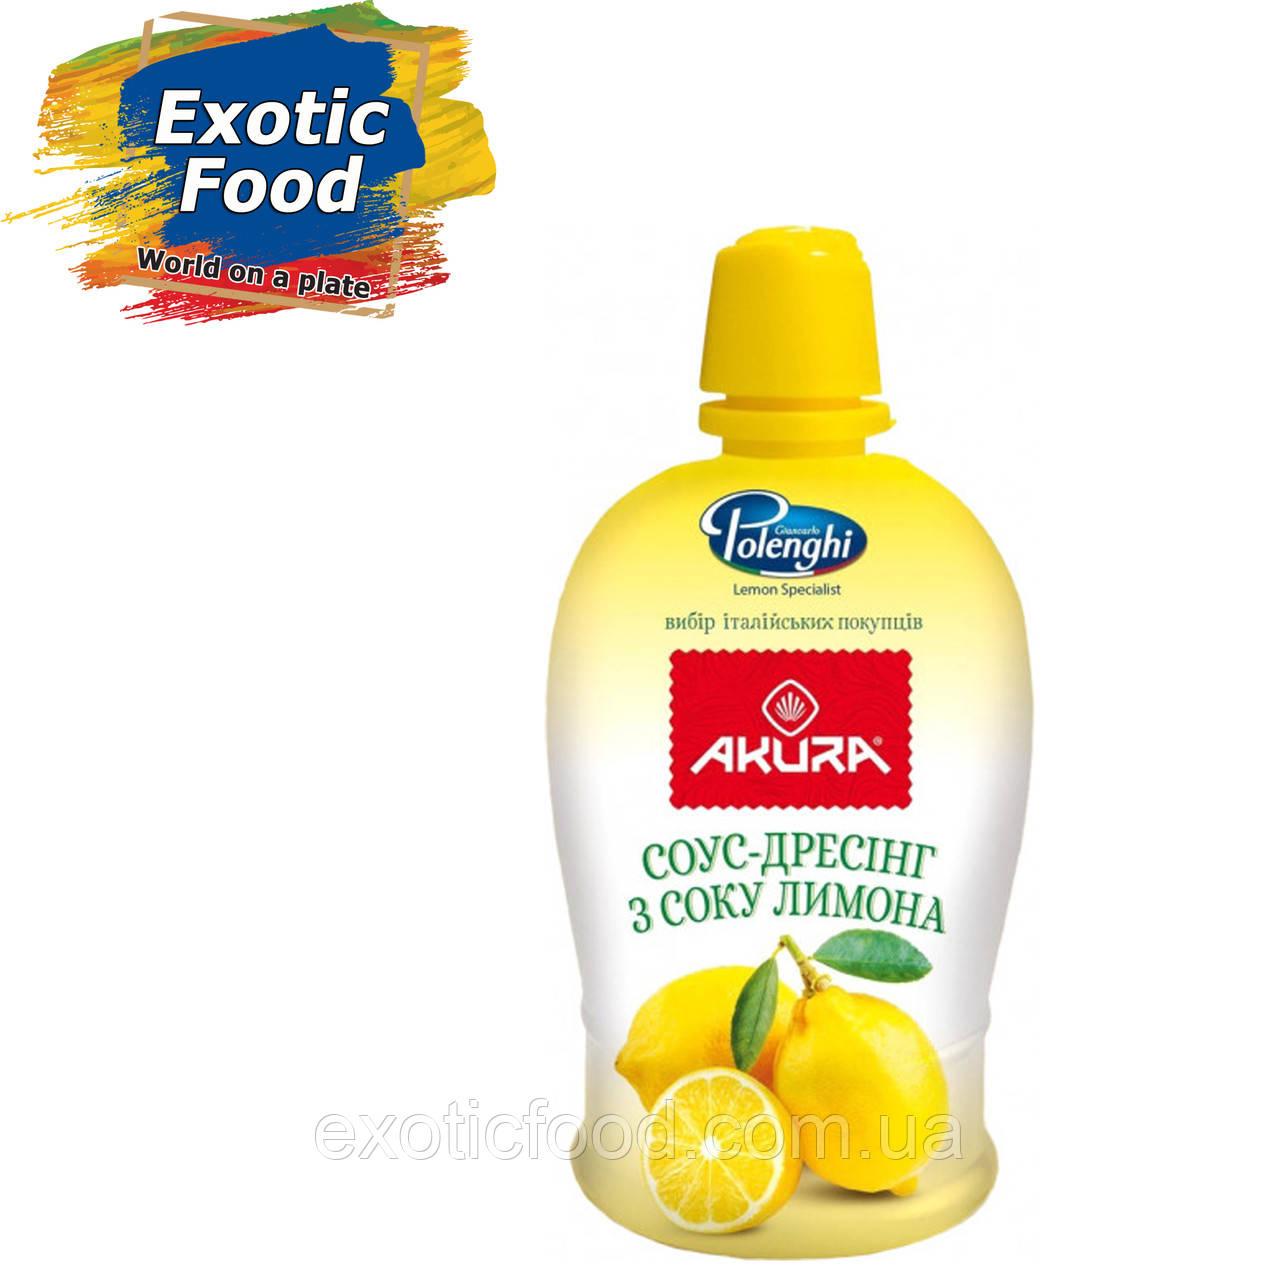 "Соус-Дрессинг из сока лимона ТМ ""AKURA"", 200 мл"